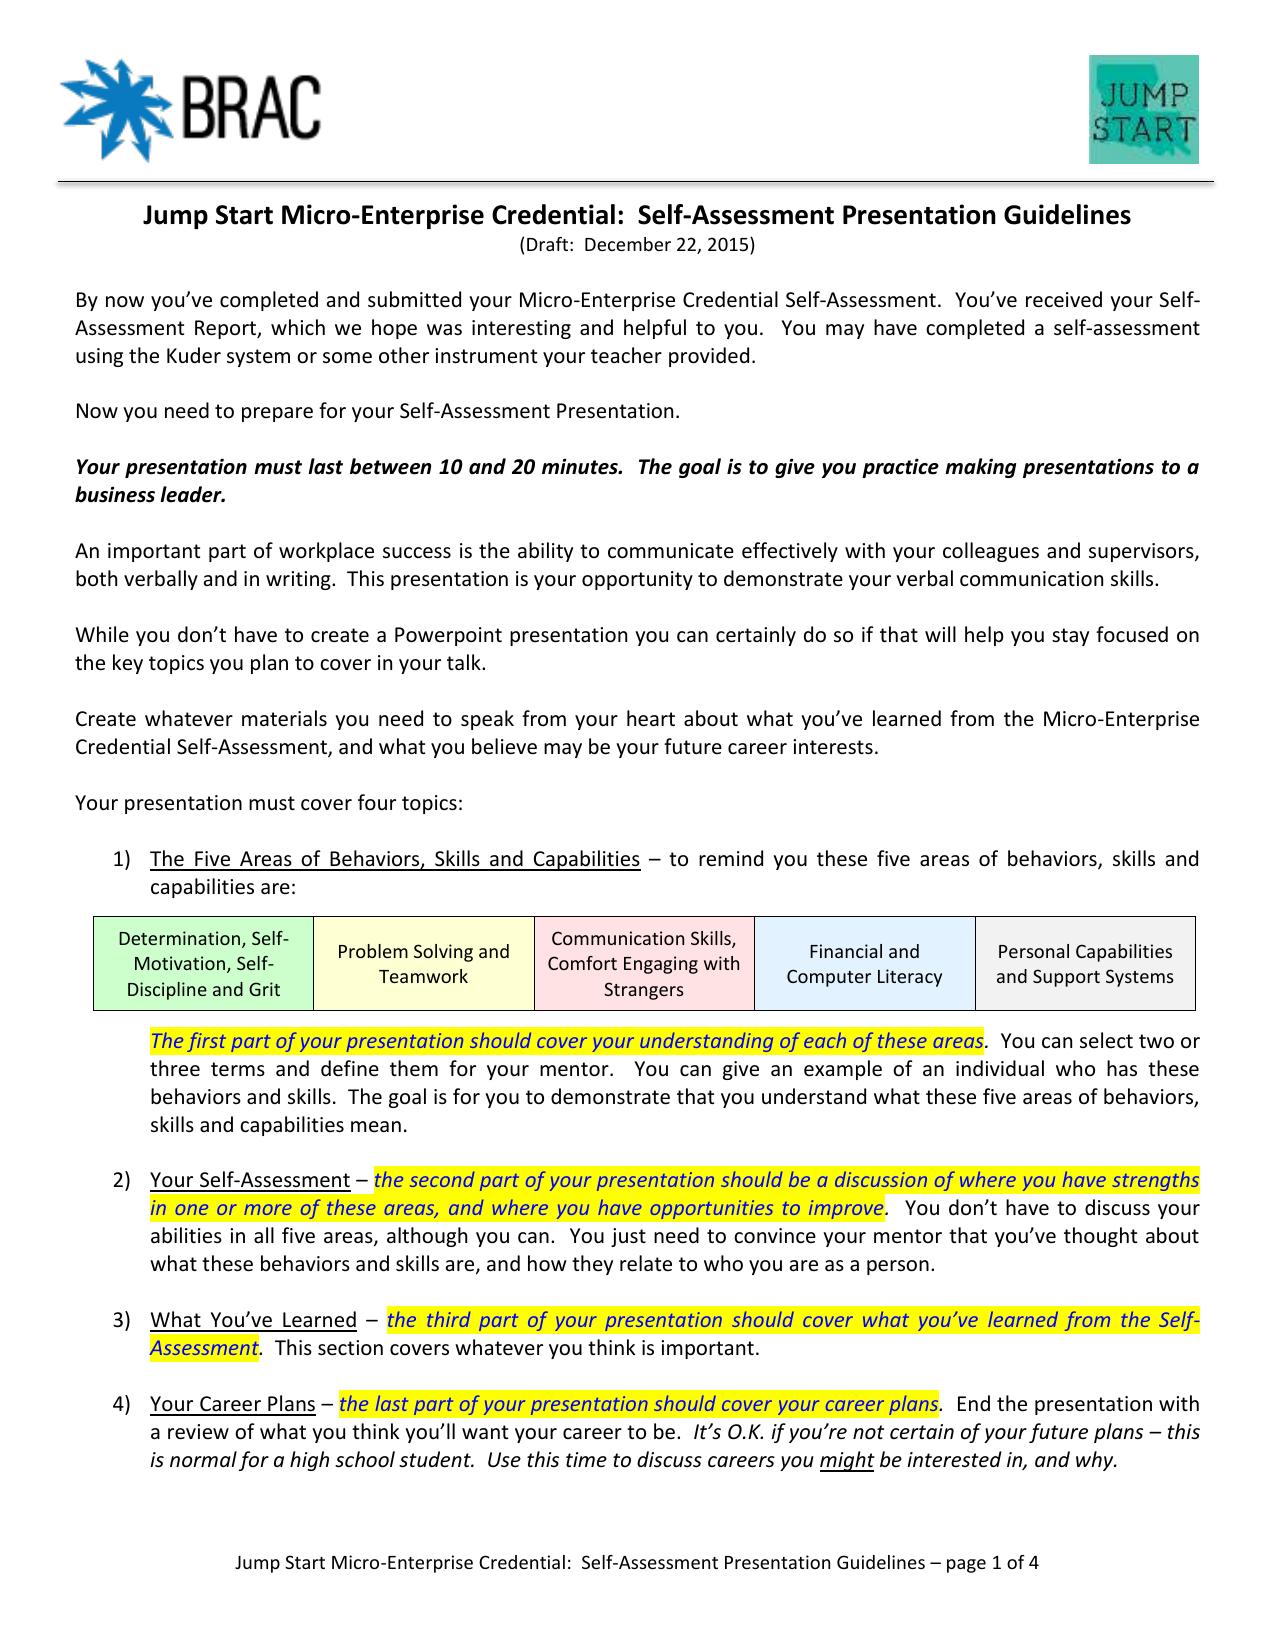 03-01 Self-Assessment Presentation Guidelines 2015-12-22